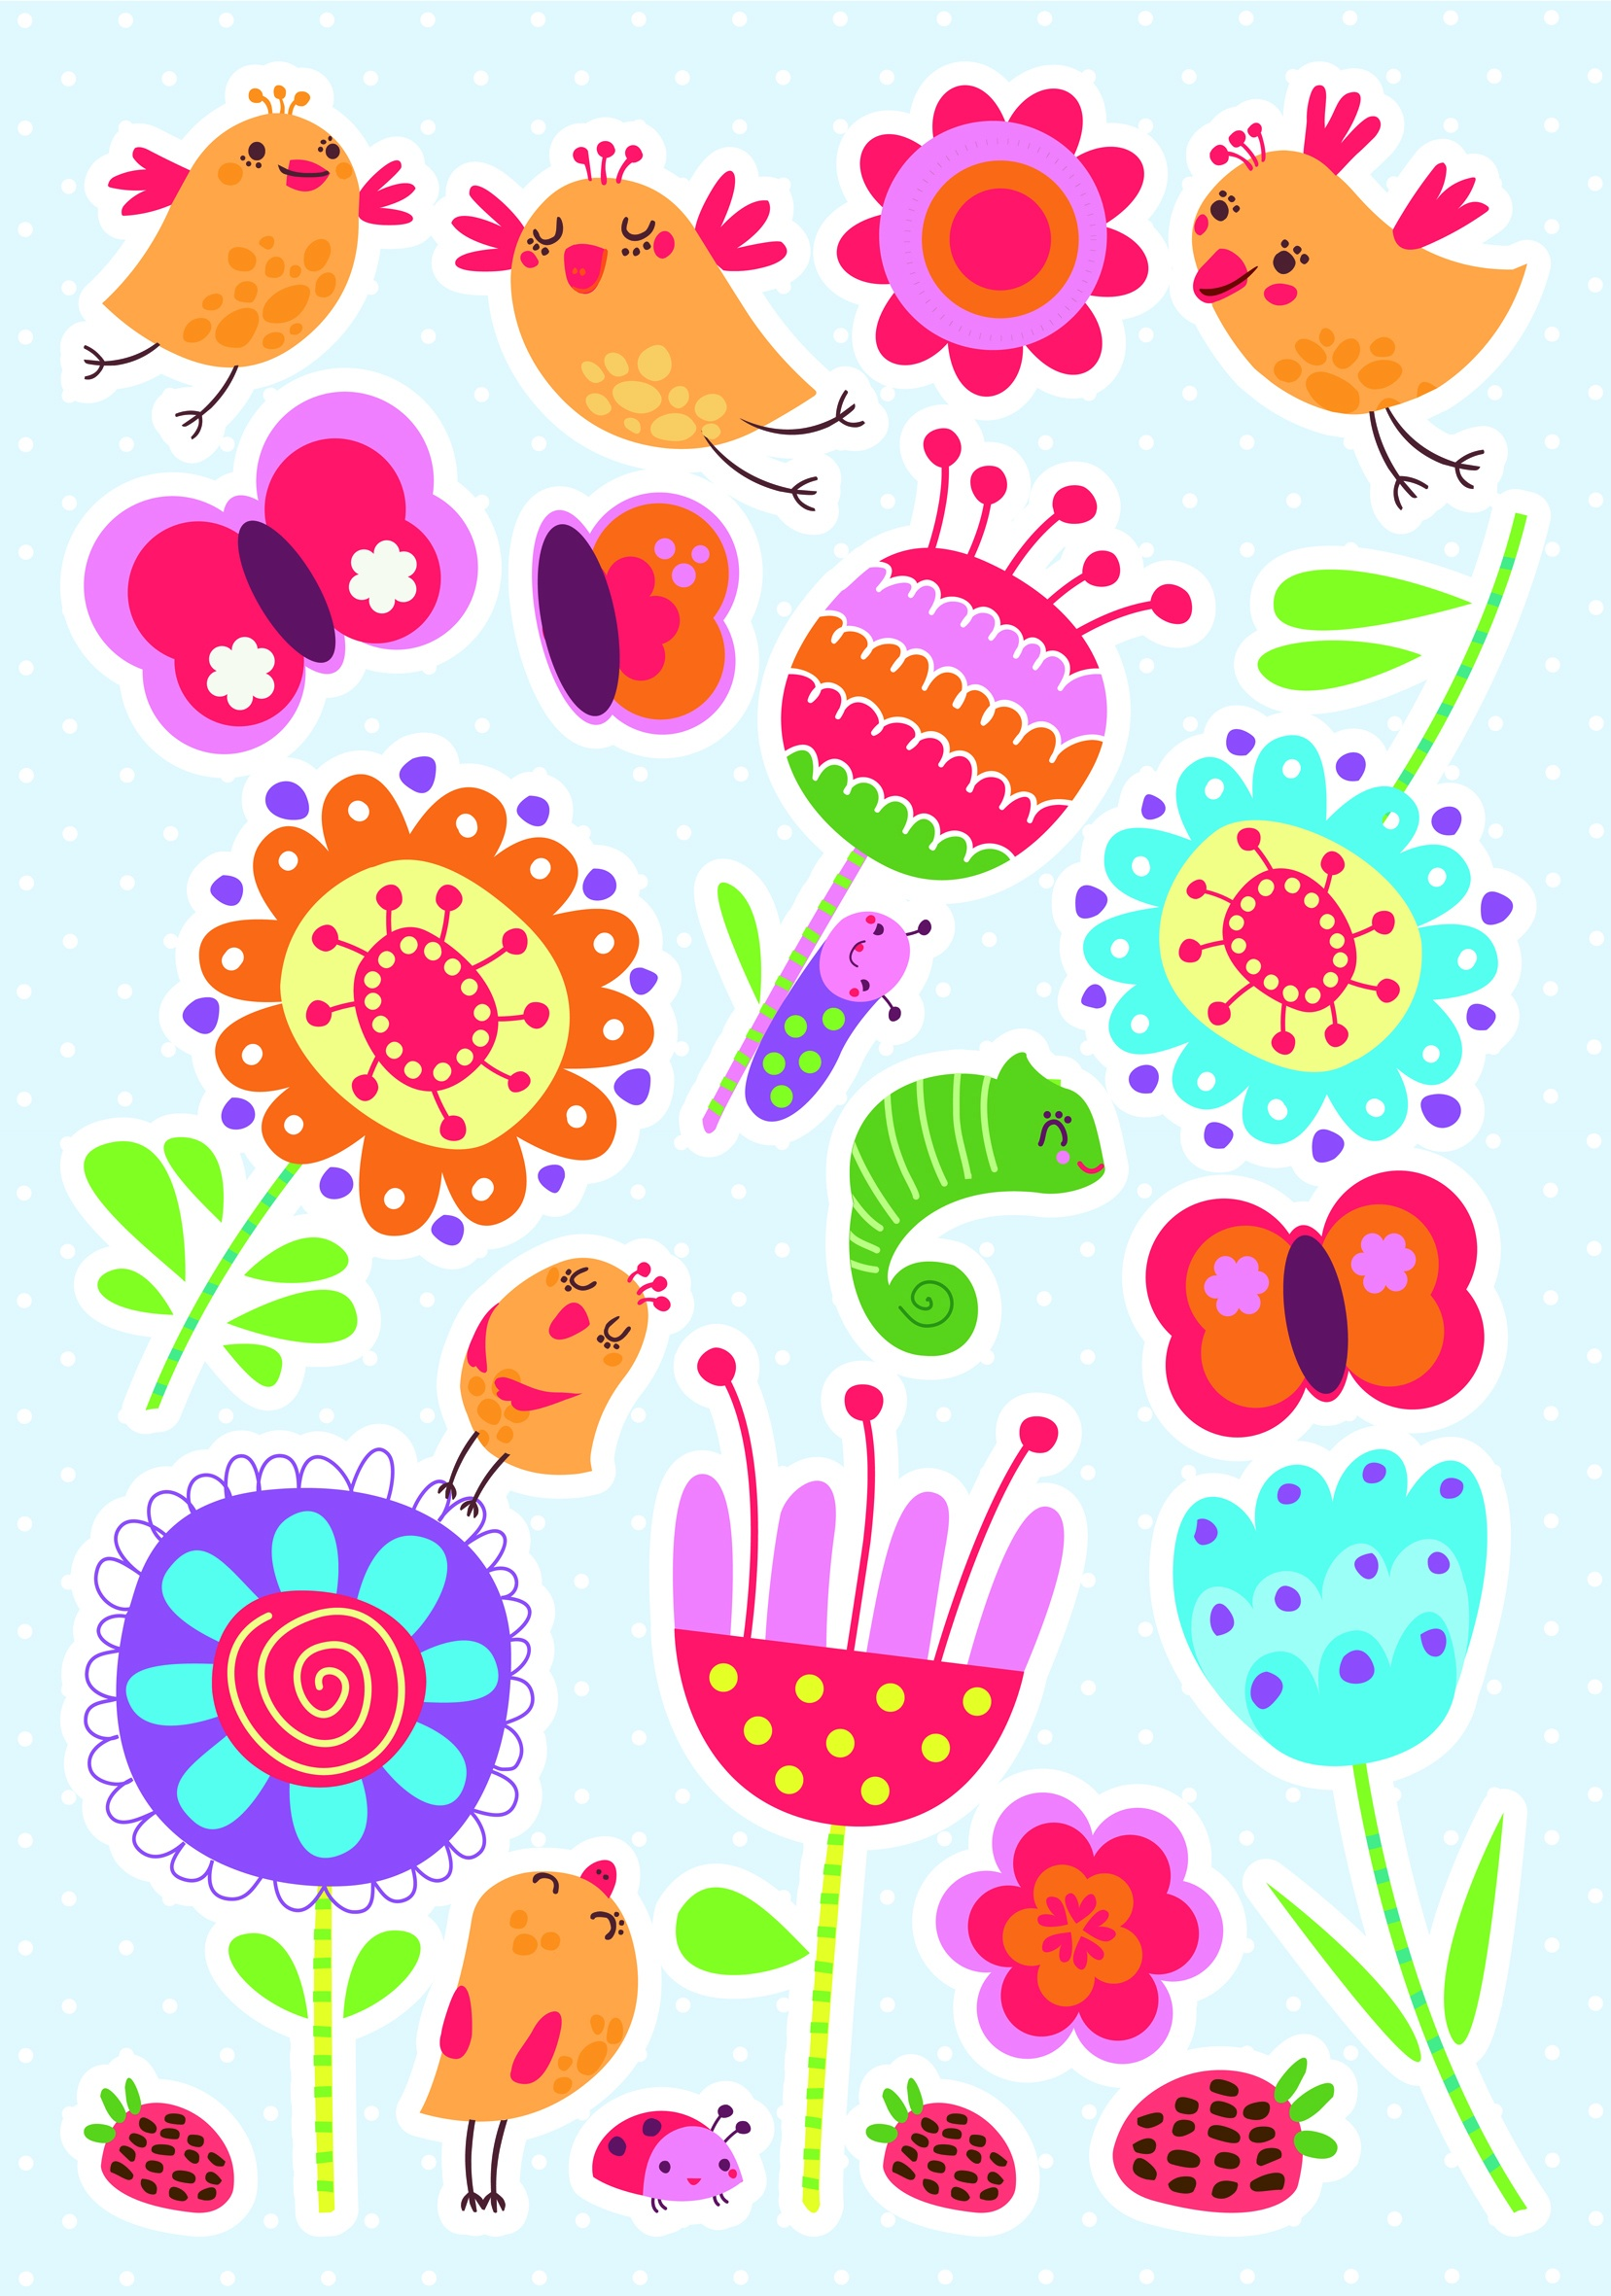 Muurstickers Den Haag.Kids Decor Wall Stickers Birds Flowers 47 X 70 Cm